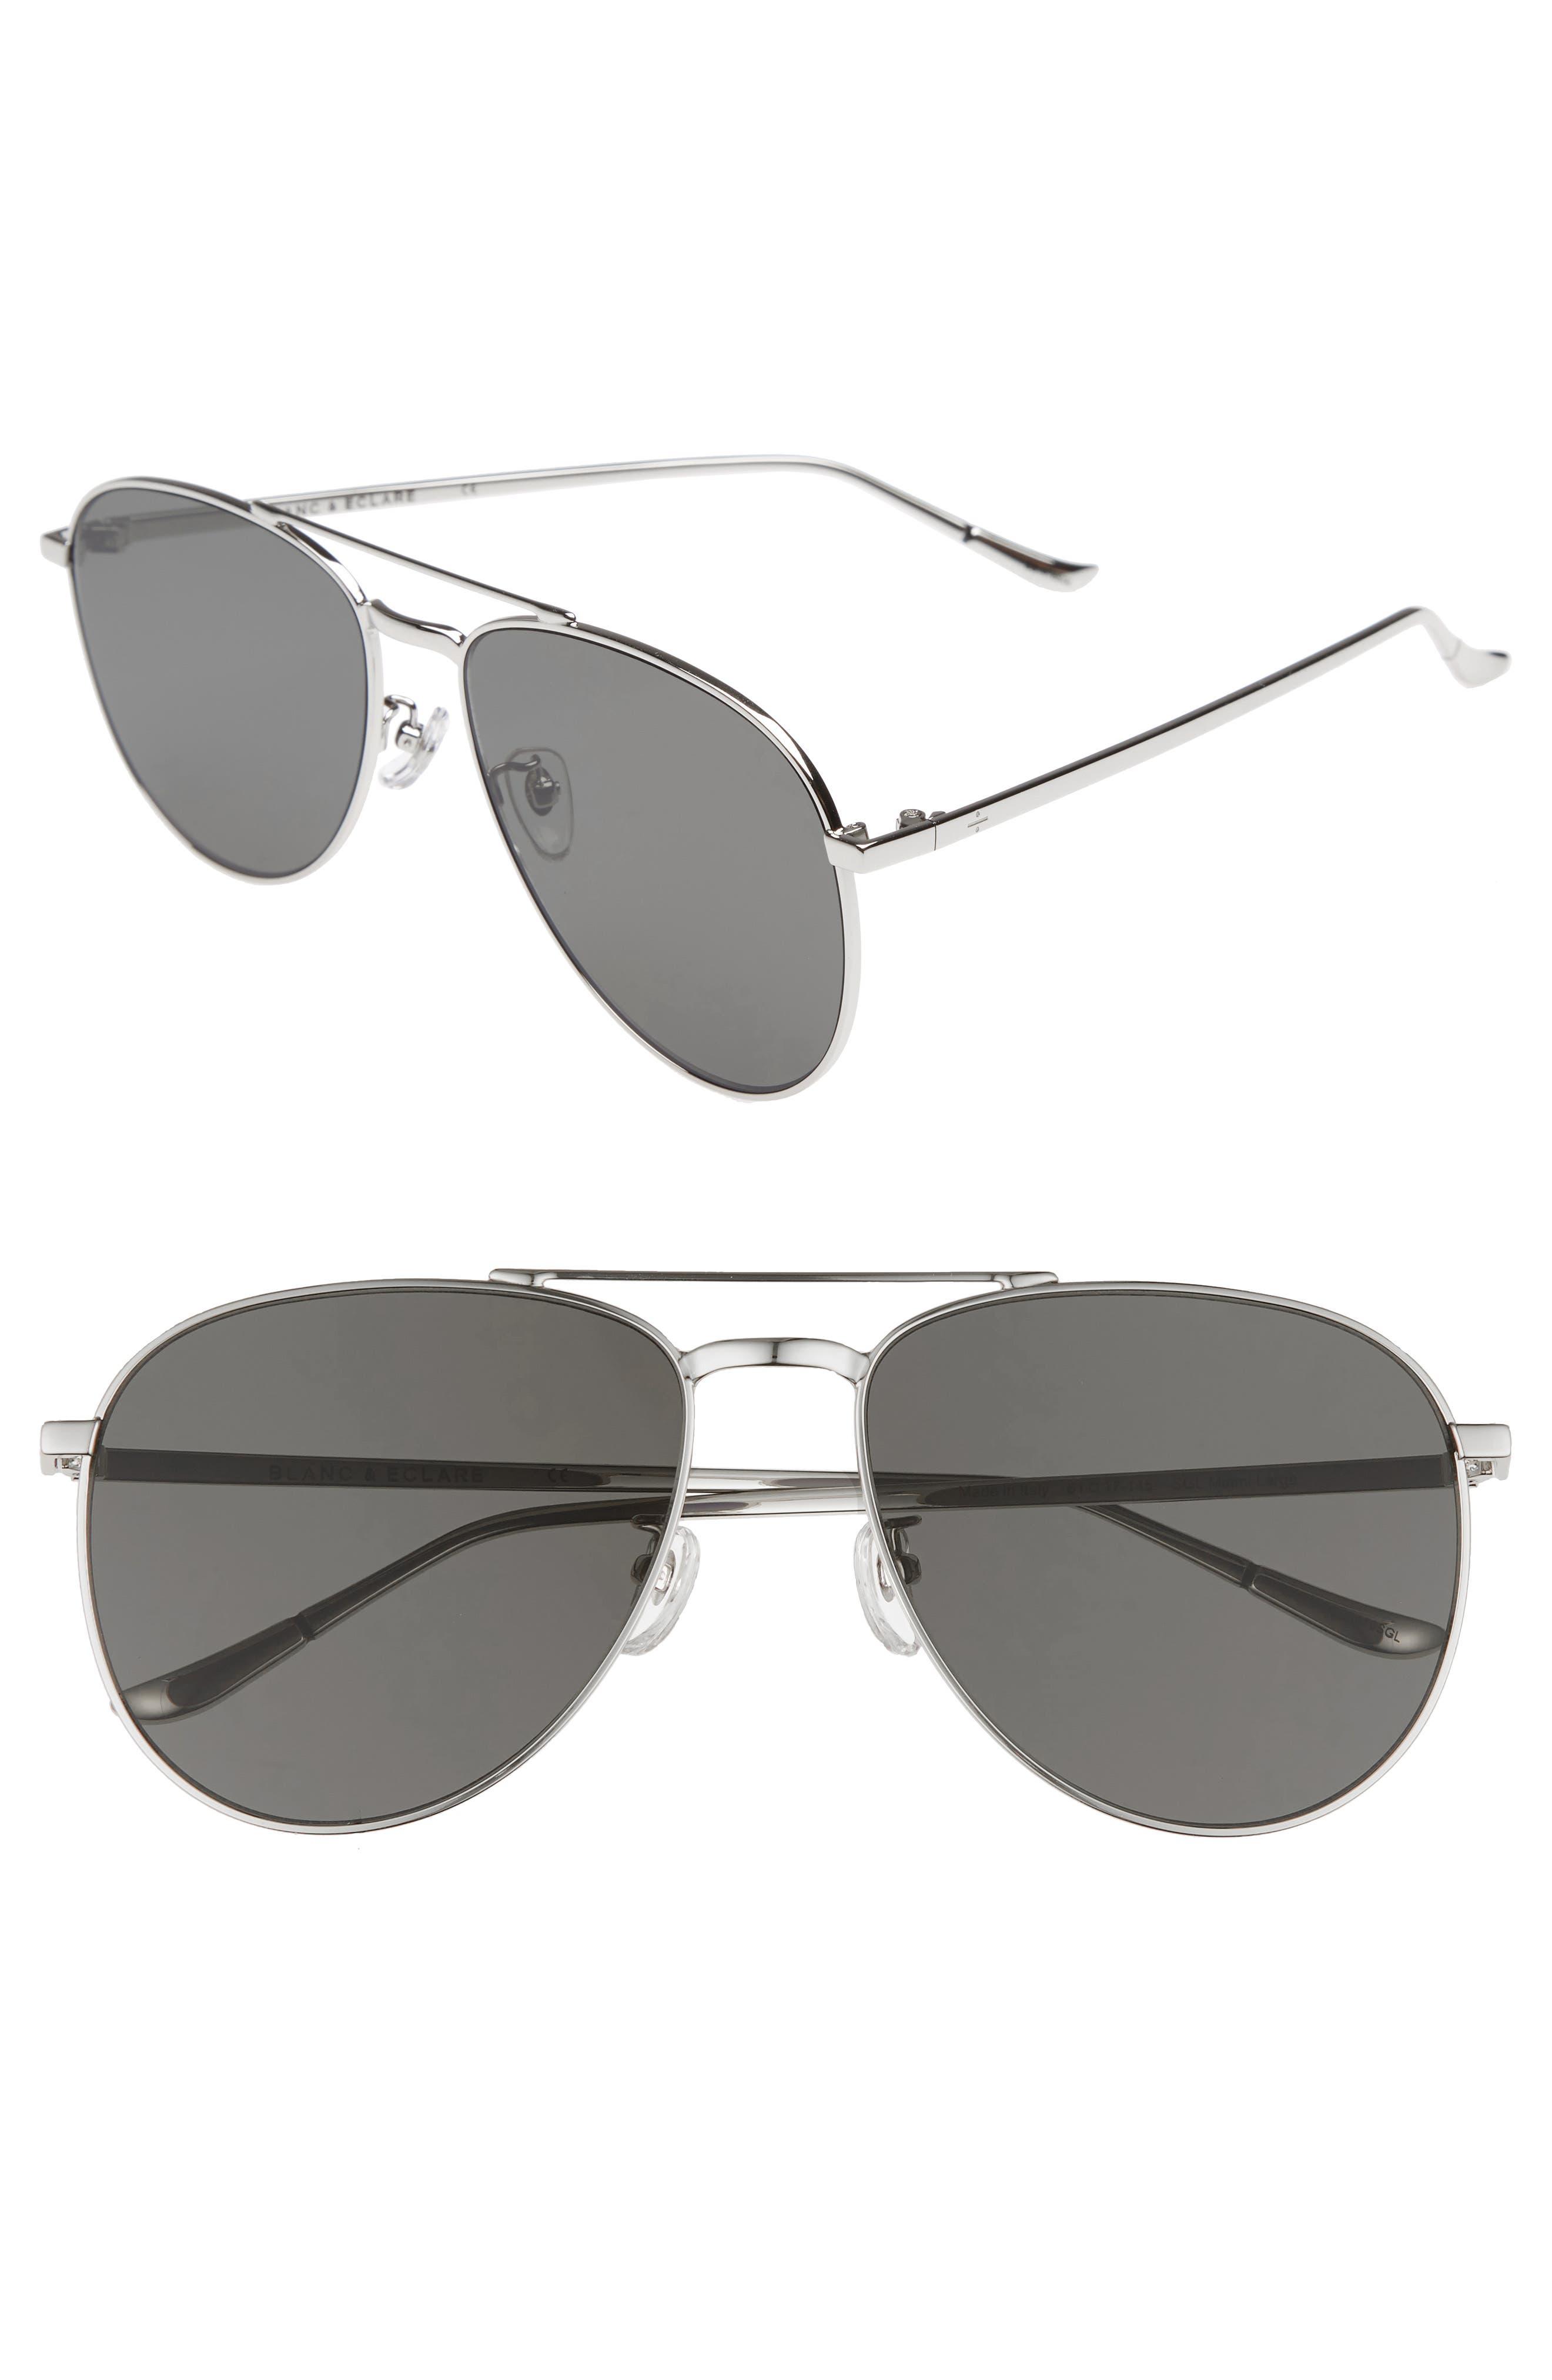 BLANC & ECLARE Miami 61mm Large Polarized Aviator Sunglasses,                             Main thumbnail 1, color,                             Silver/ Grey